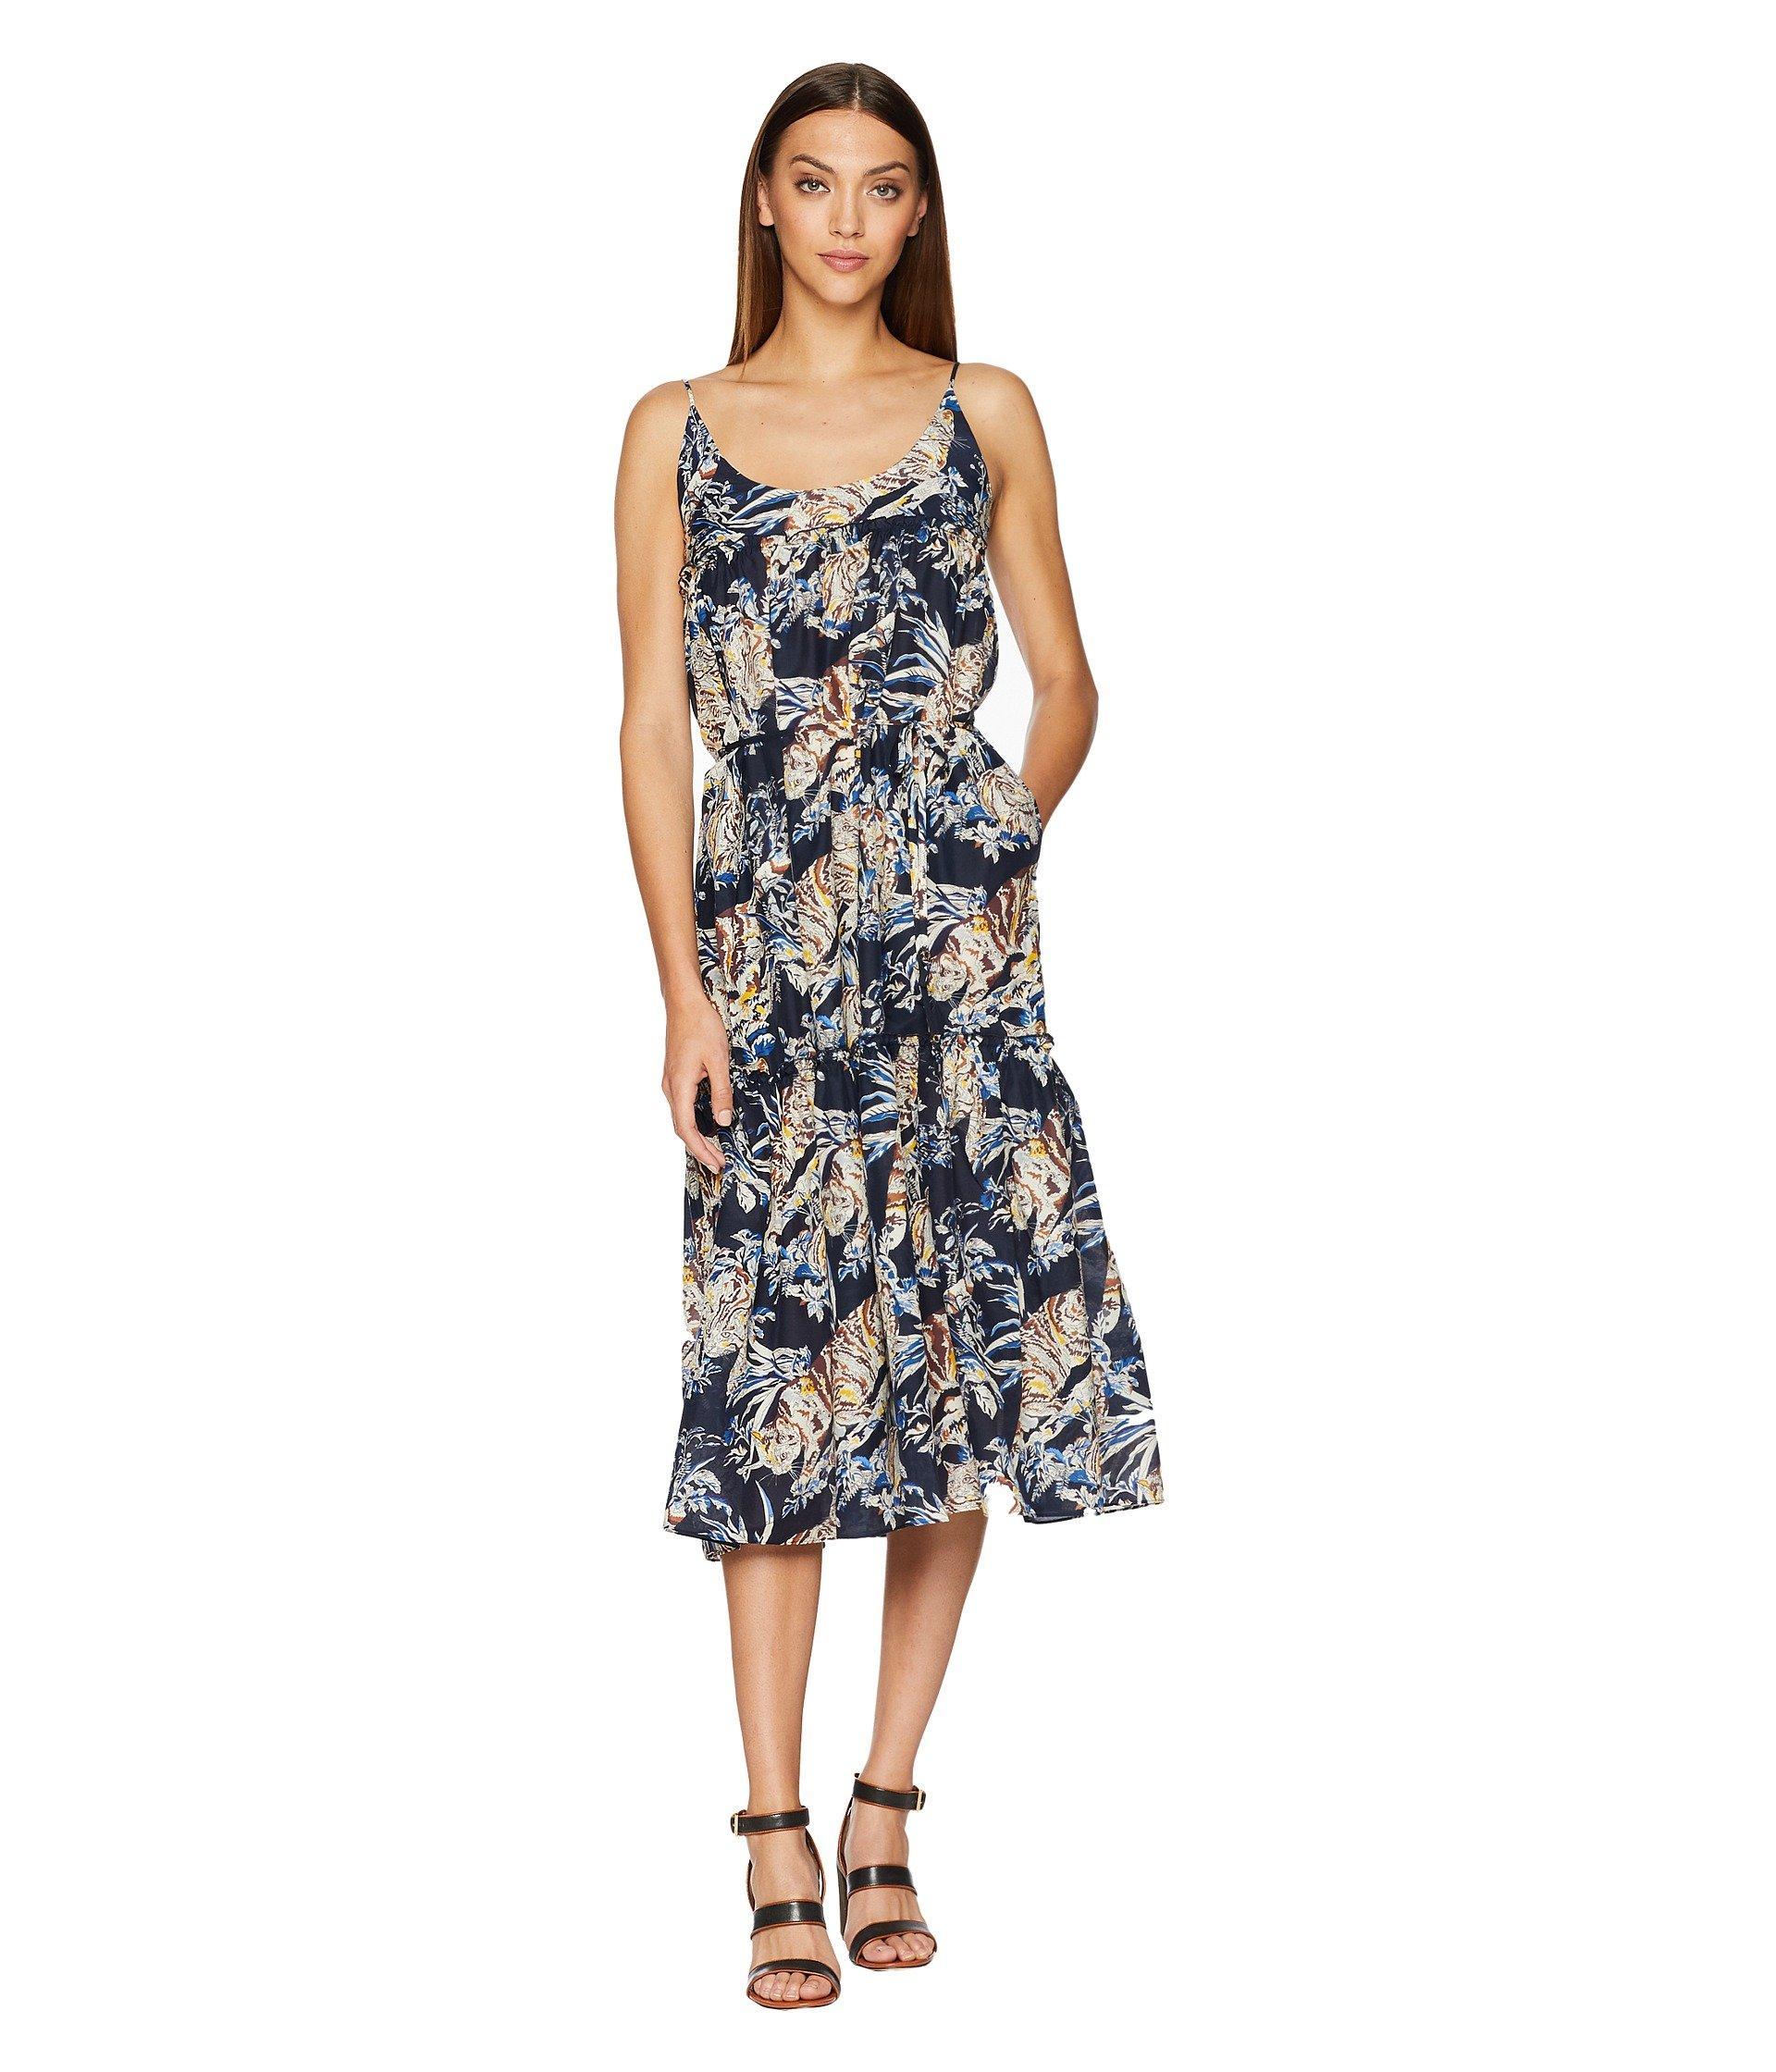 374bcaaefac38 Lyst - Stella McCartney Jungle Print Maxi Dress in Blue